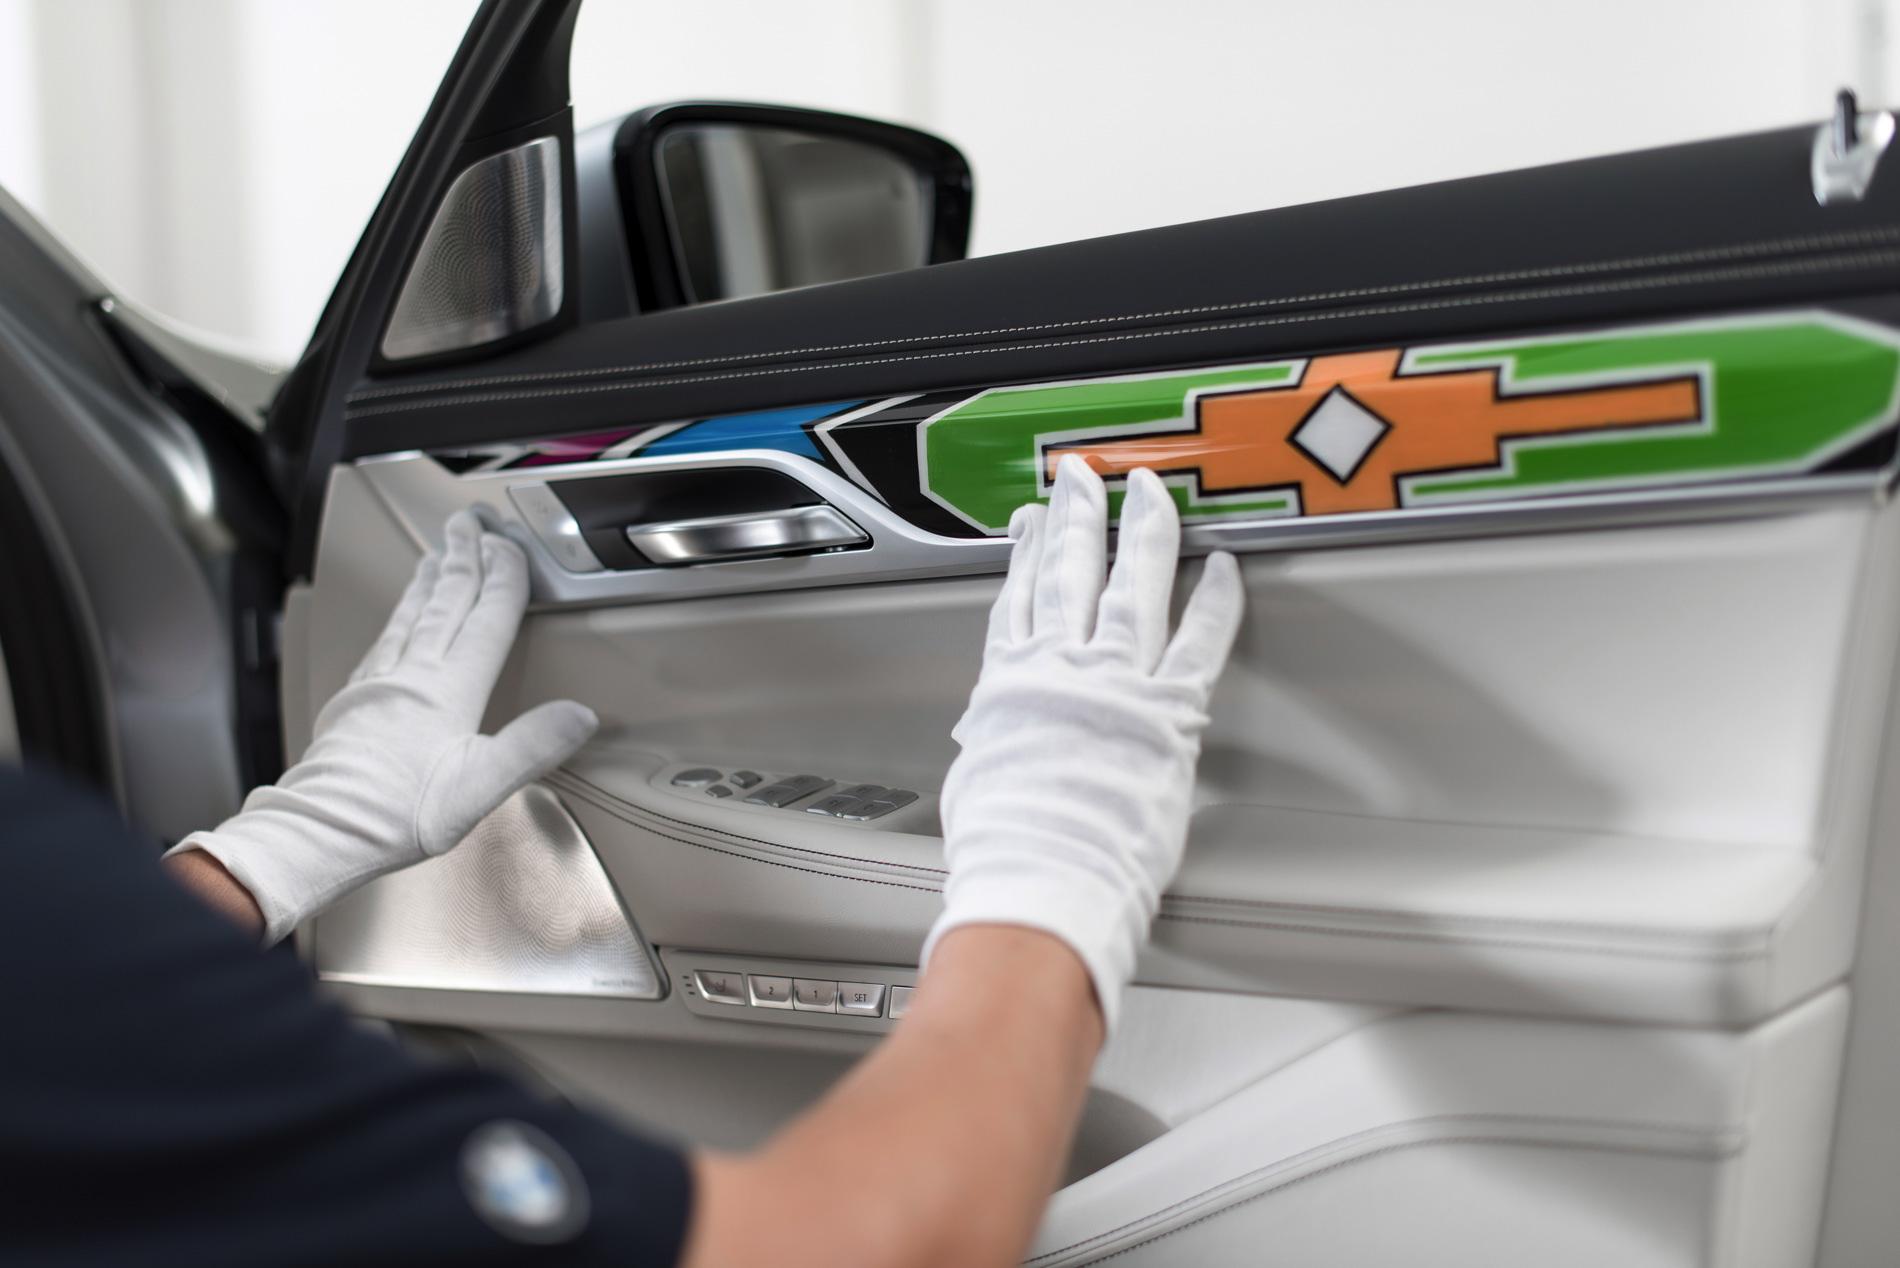 ESTER MAHLANGU X BMW 7 SERIES